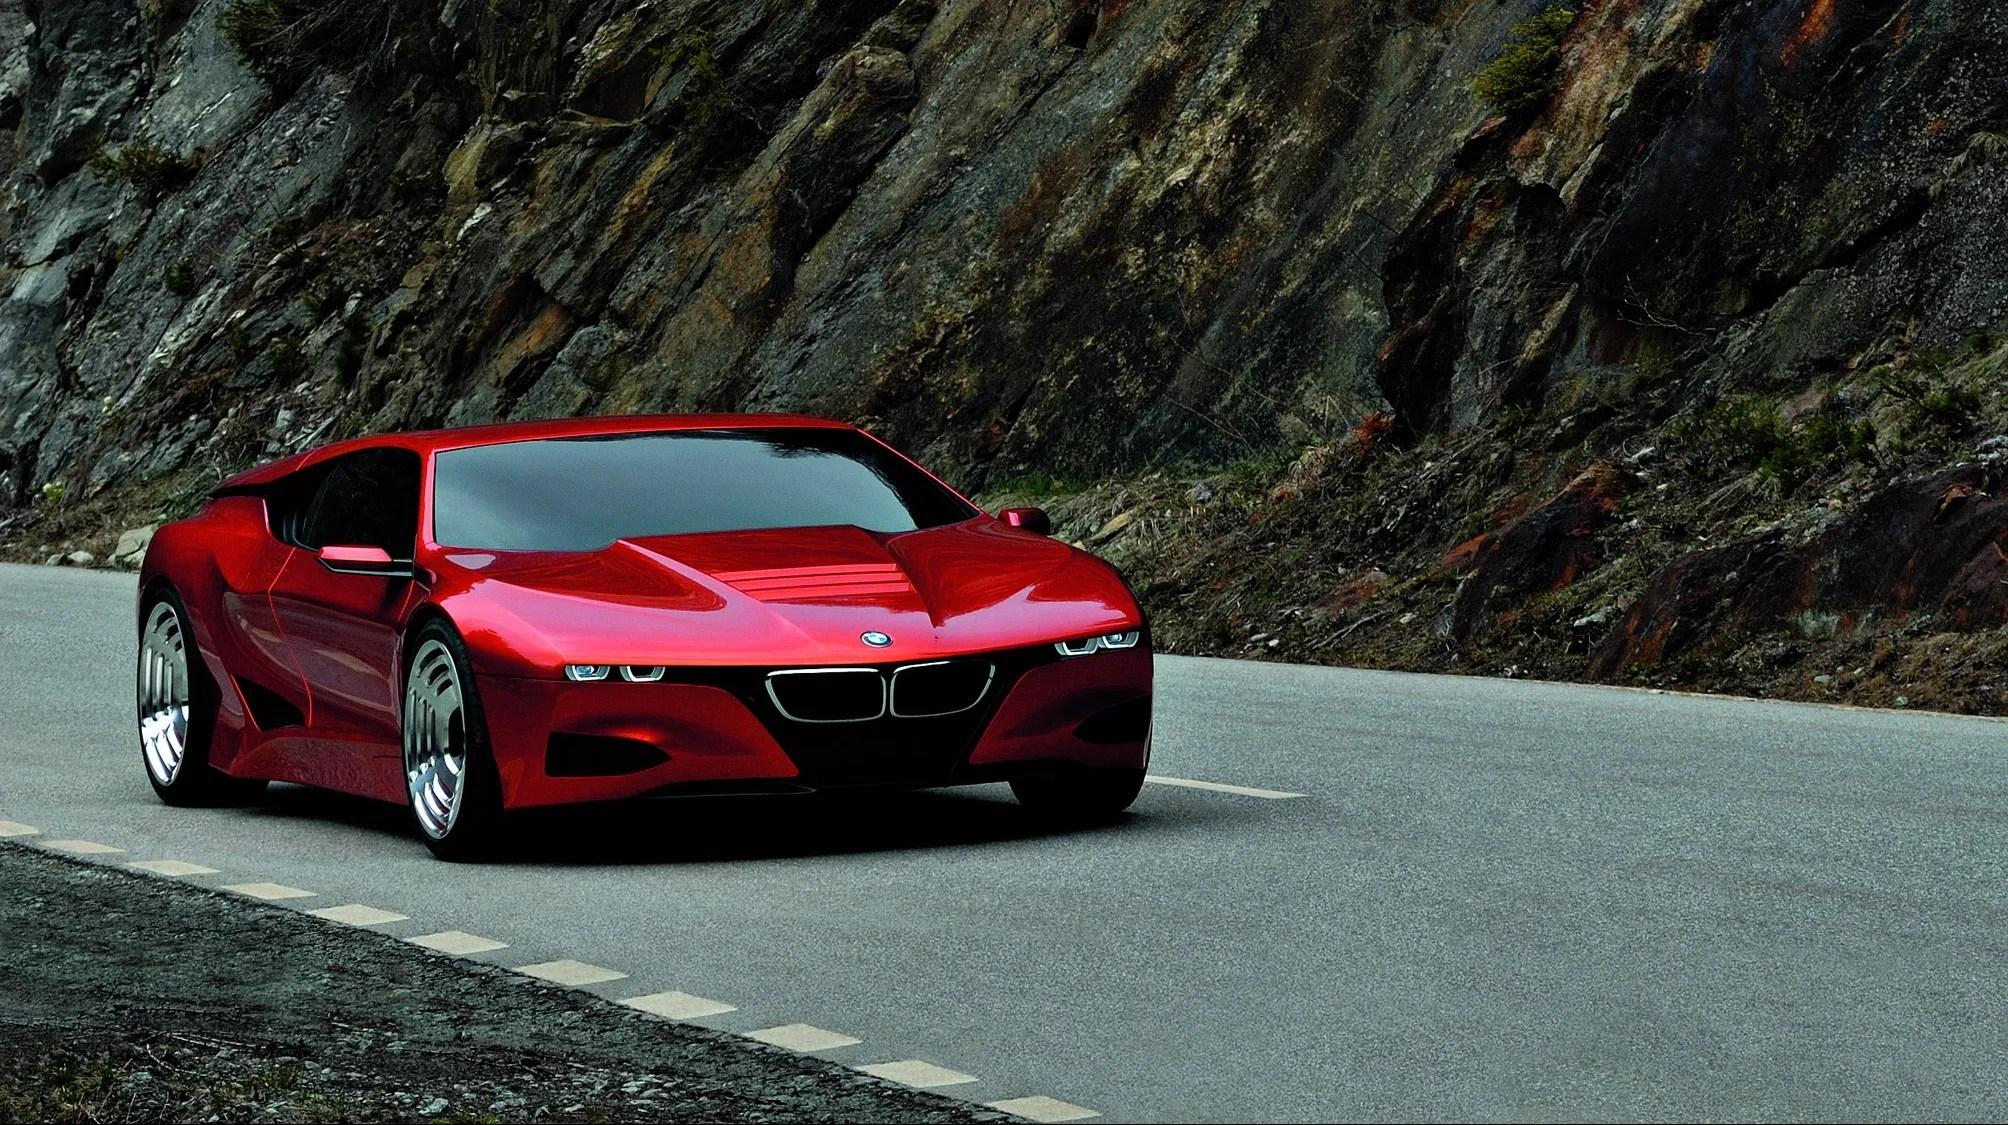 Best Looking Car Wallpaper 2008 Bmw M1 Hommage Top Speed